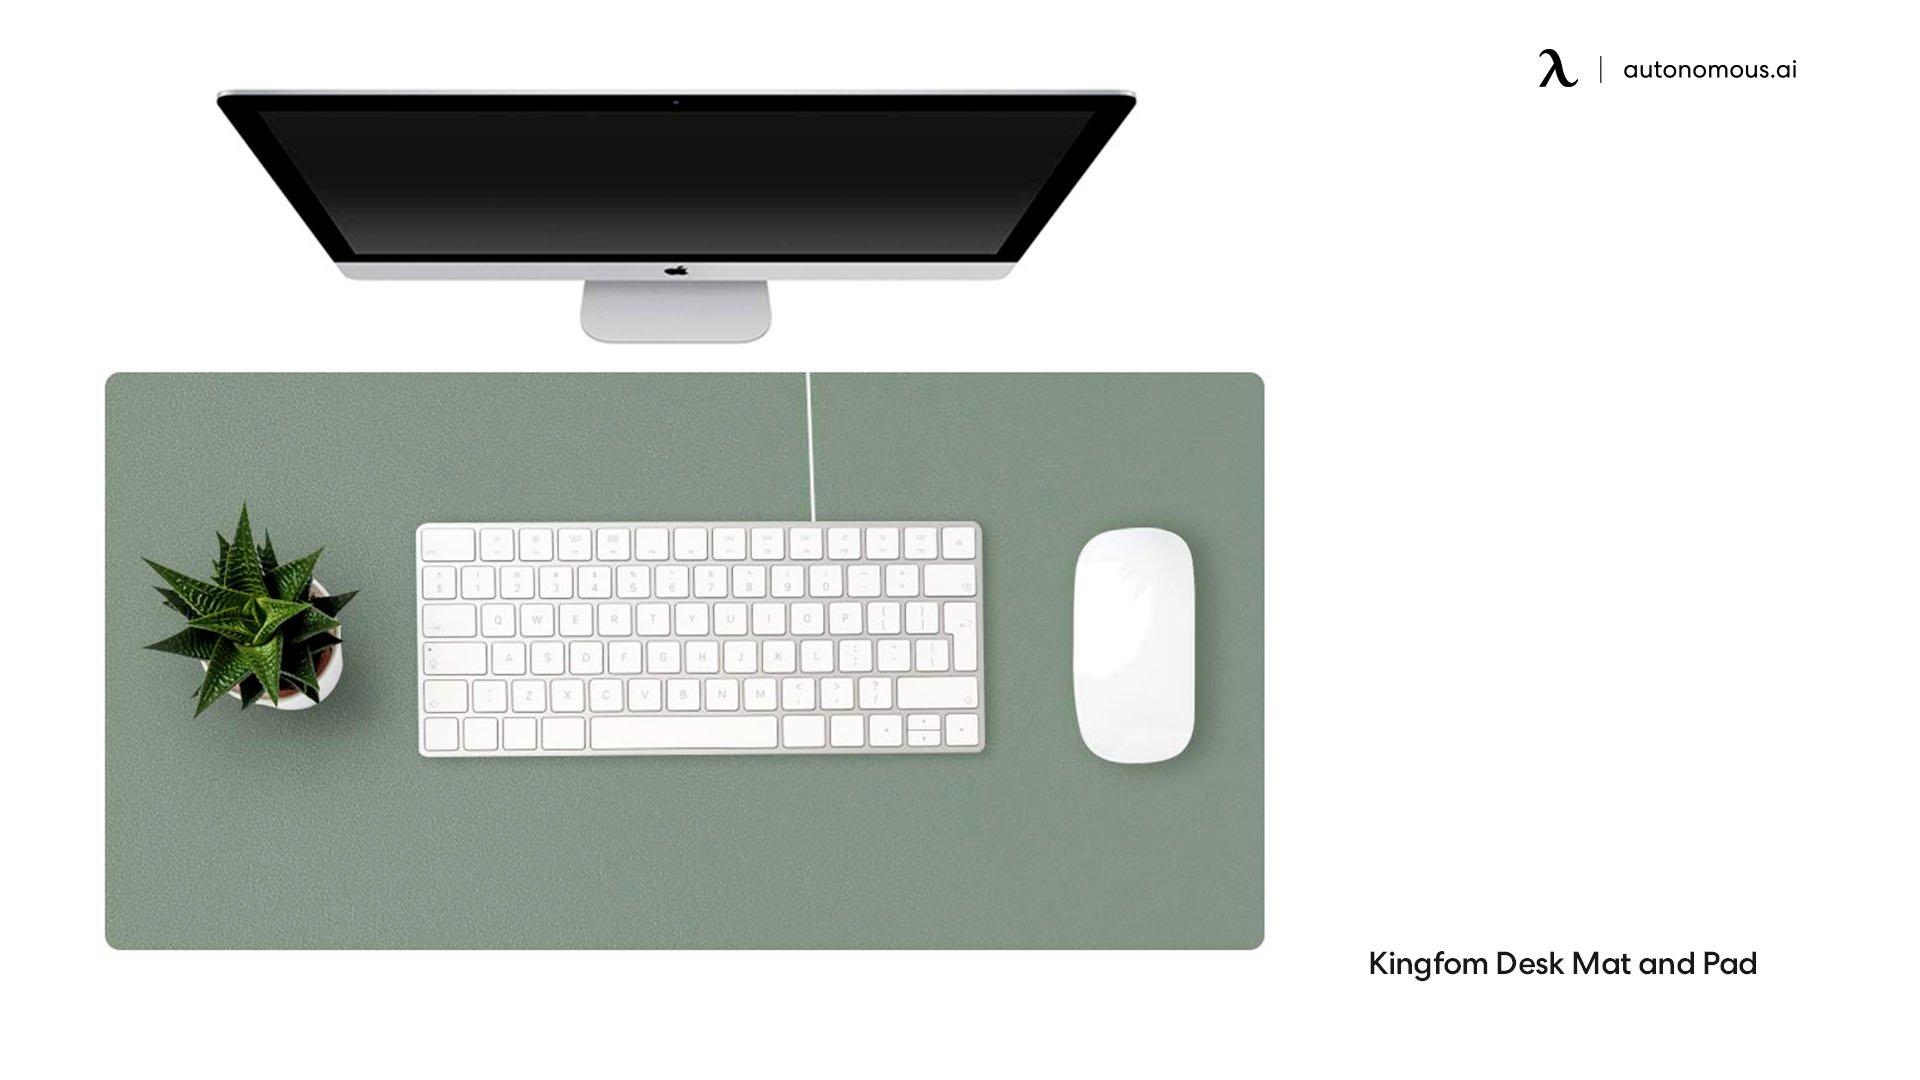 Kingdom Desk Mat and Pad